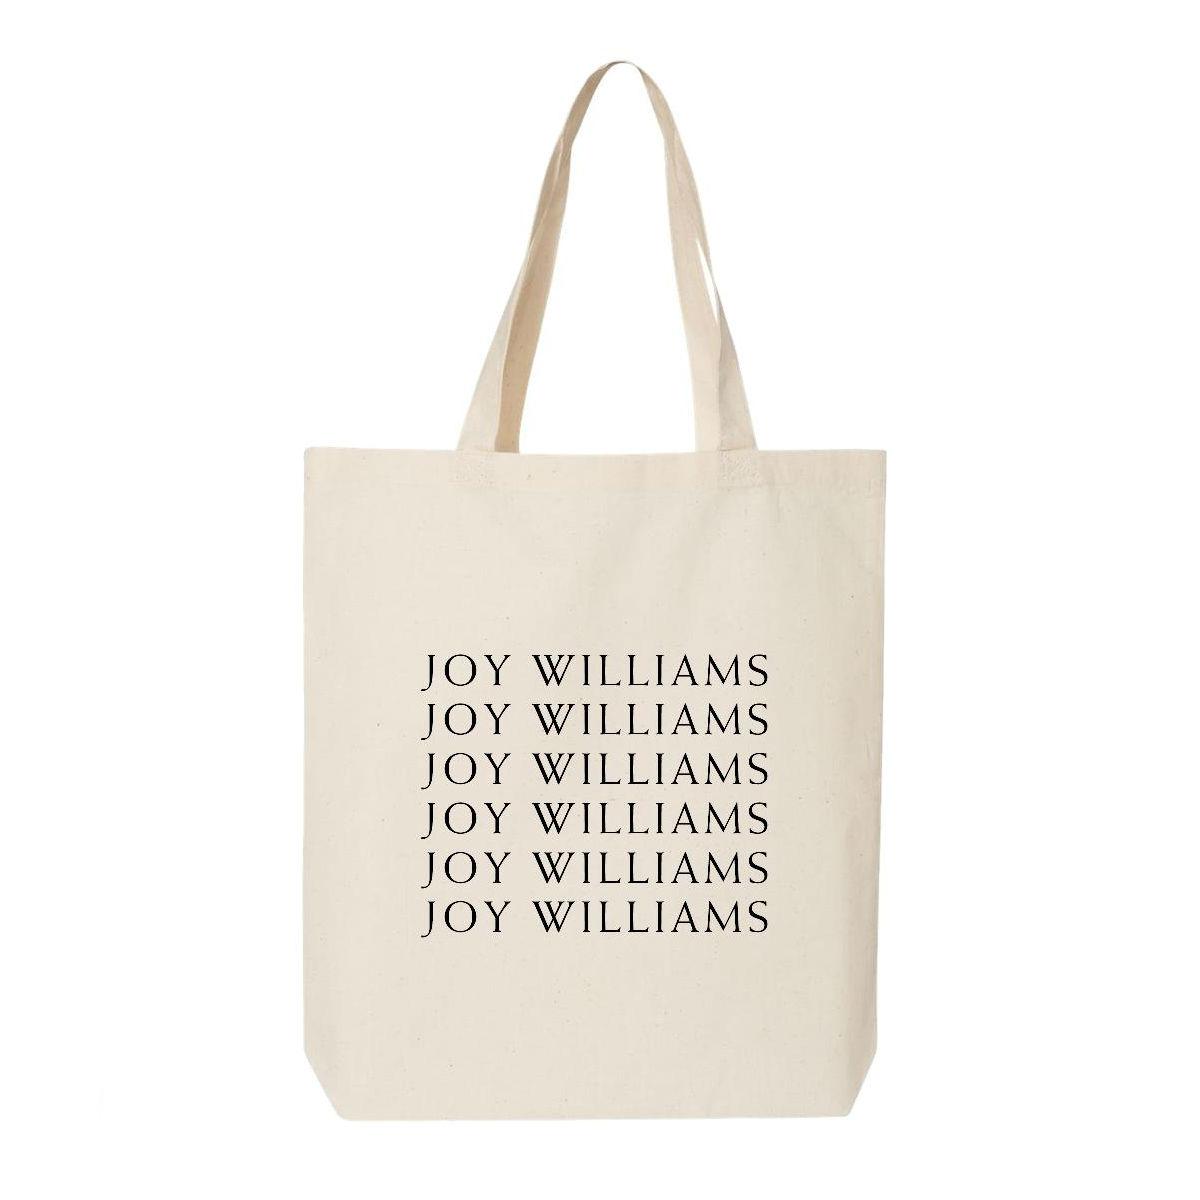 Joy Williams Tote